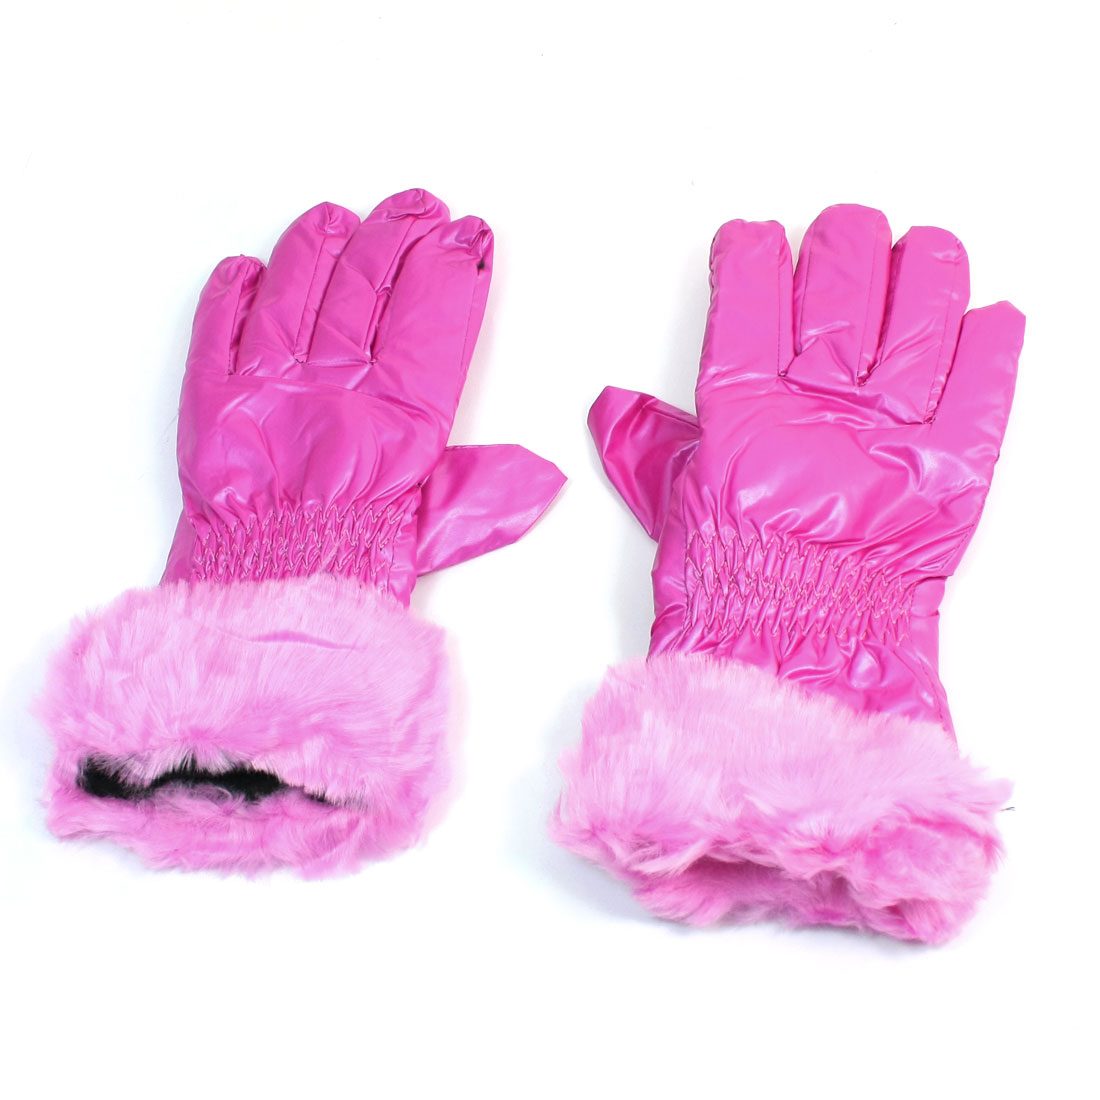 Lady Women Ruched Decor Full Finger Winter Warm Gloves Fushcia